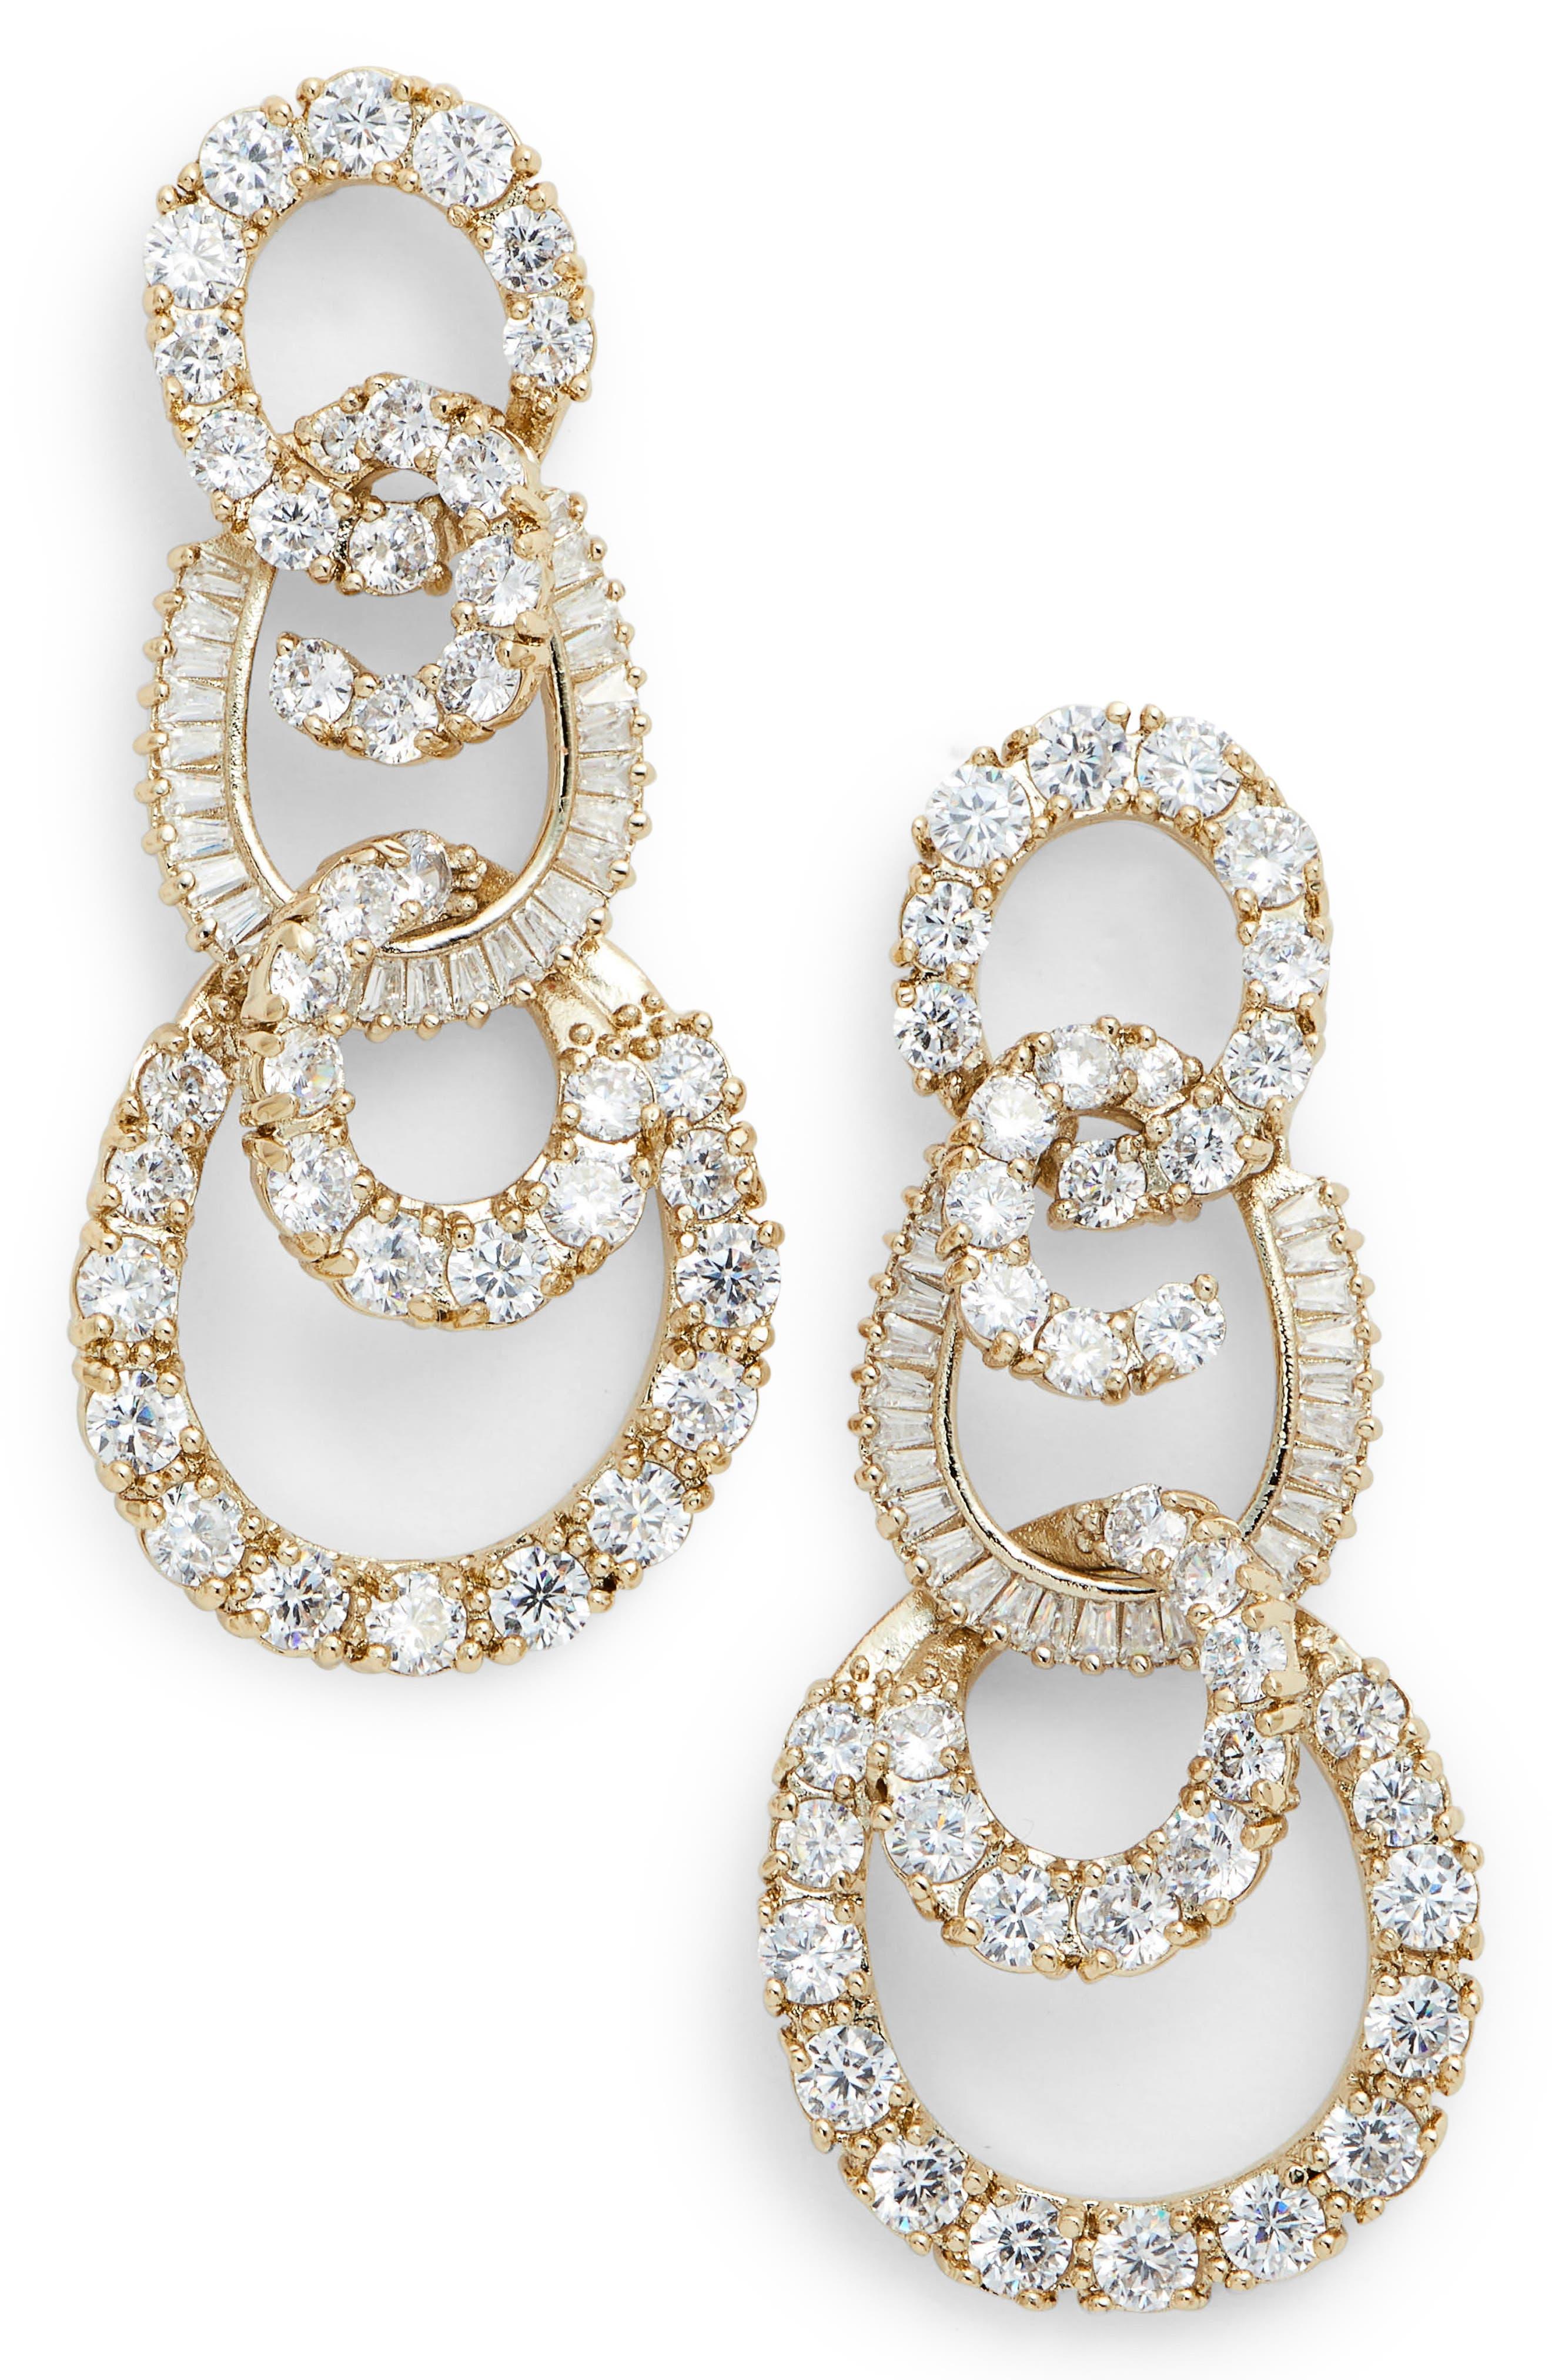 3-Tier Swirl Drop Earrings,                             Main thumbnail 1, color,                             White/ Gold